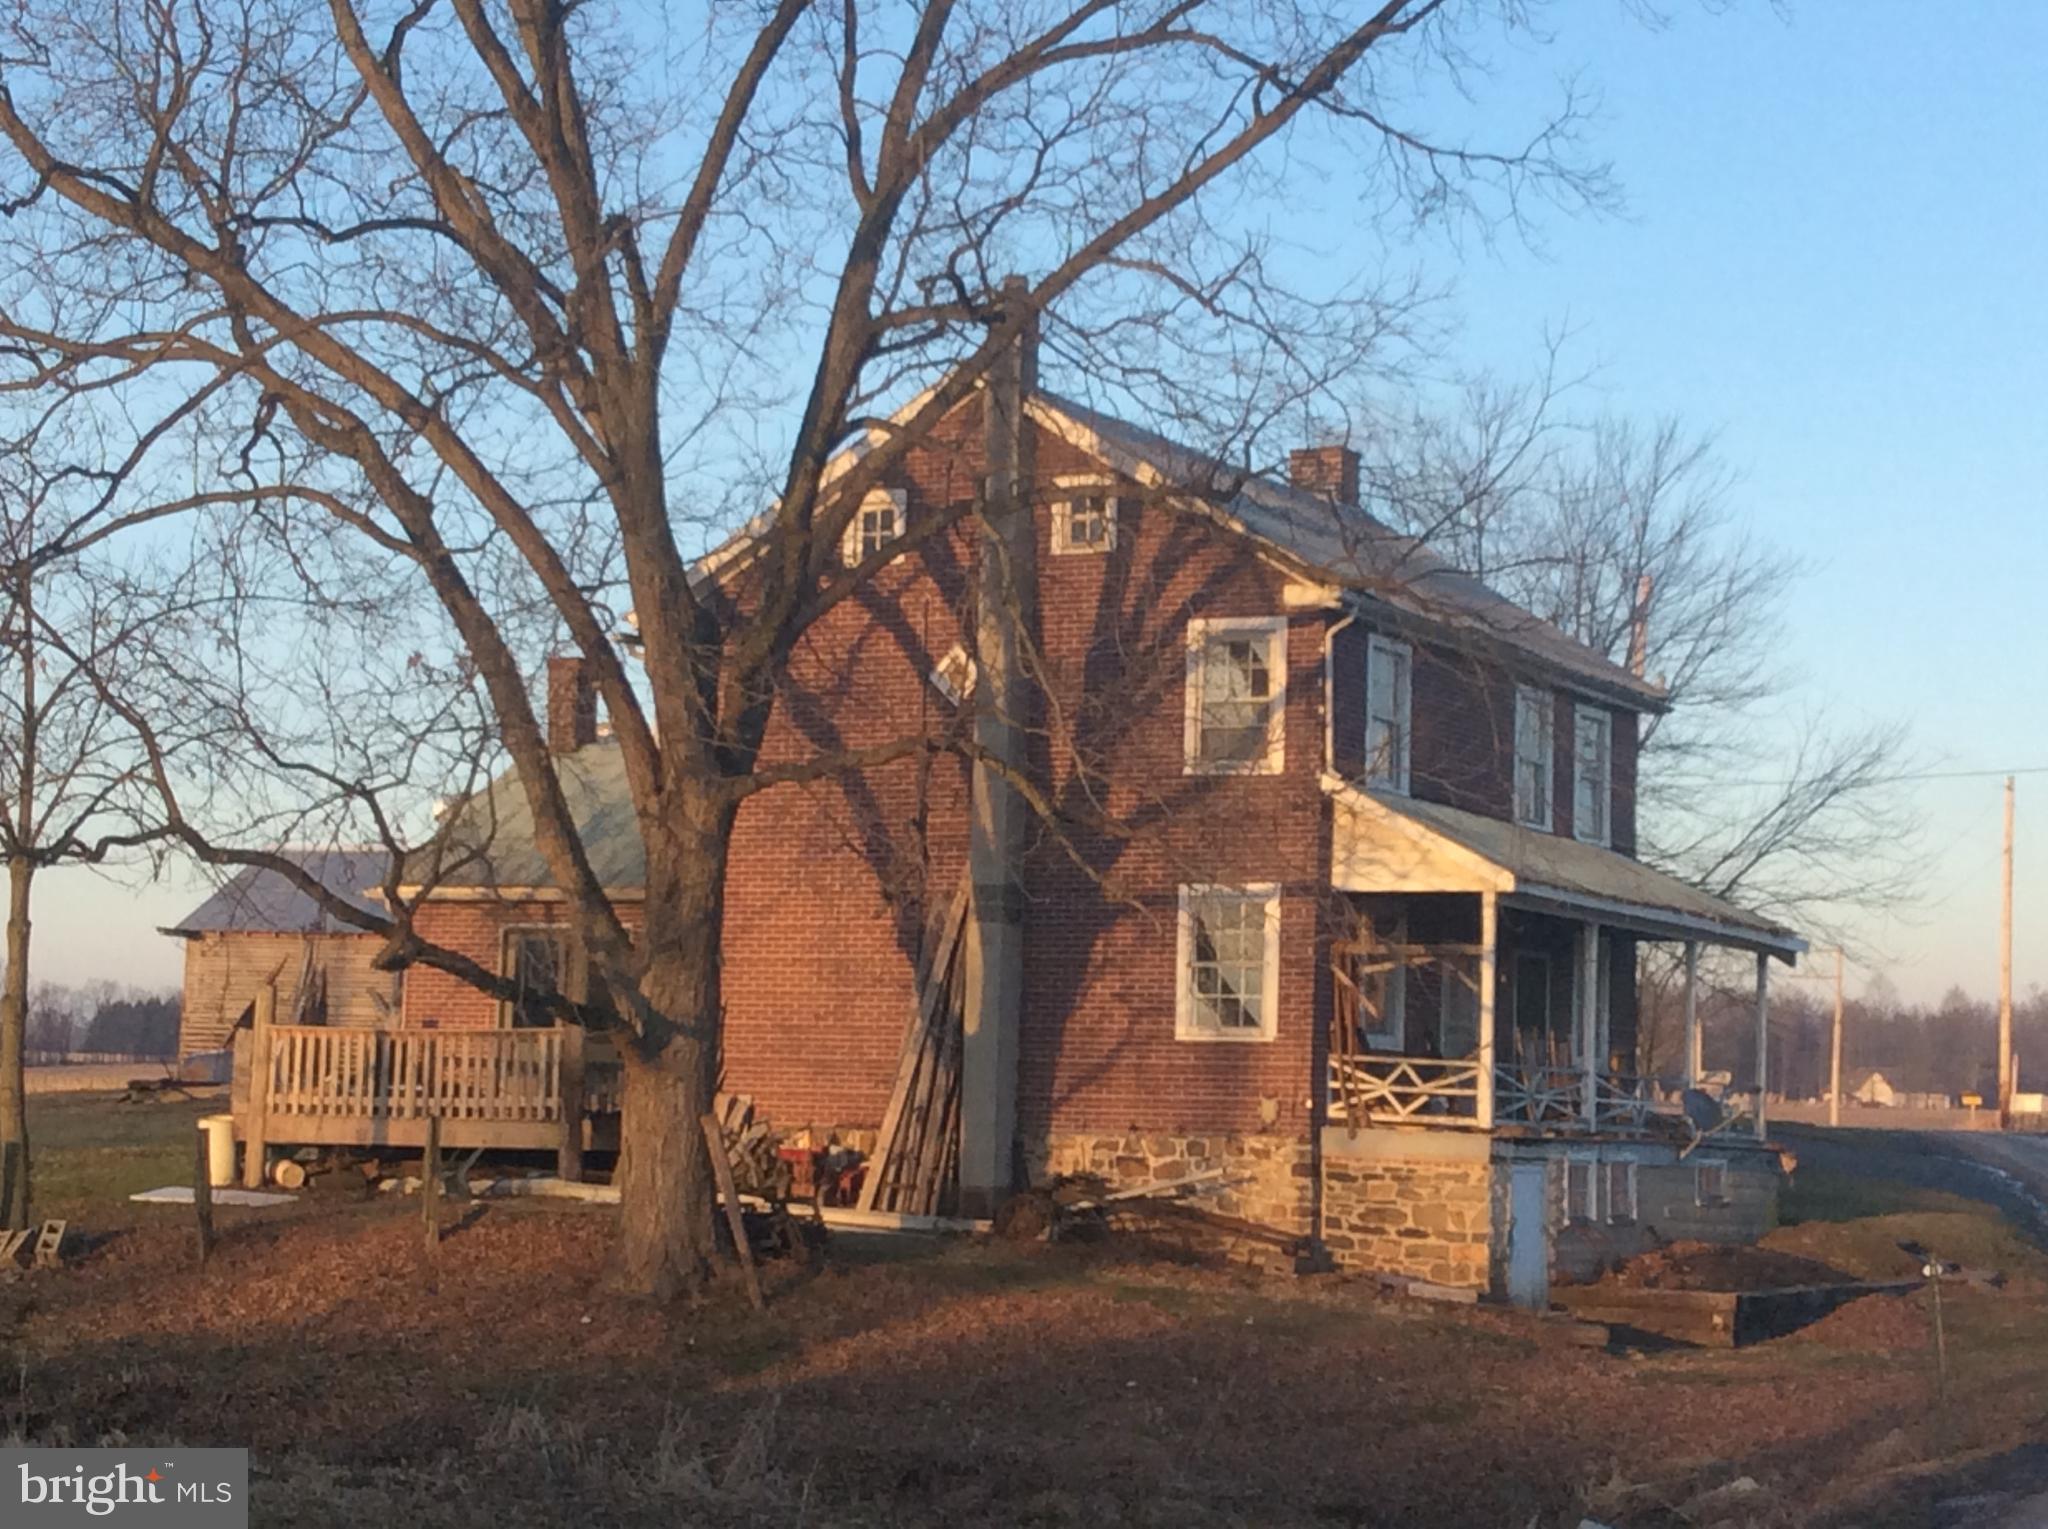 260 Frazier Rd, Aspers, PA, 17304